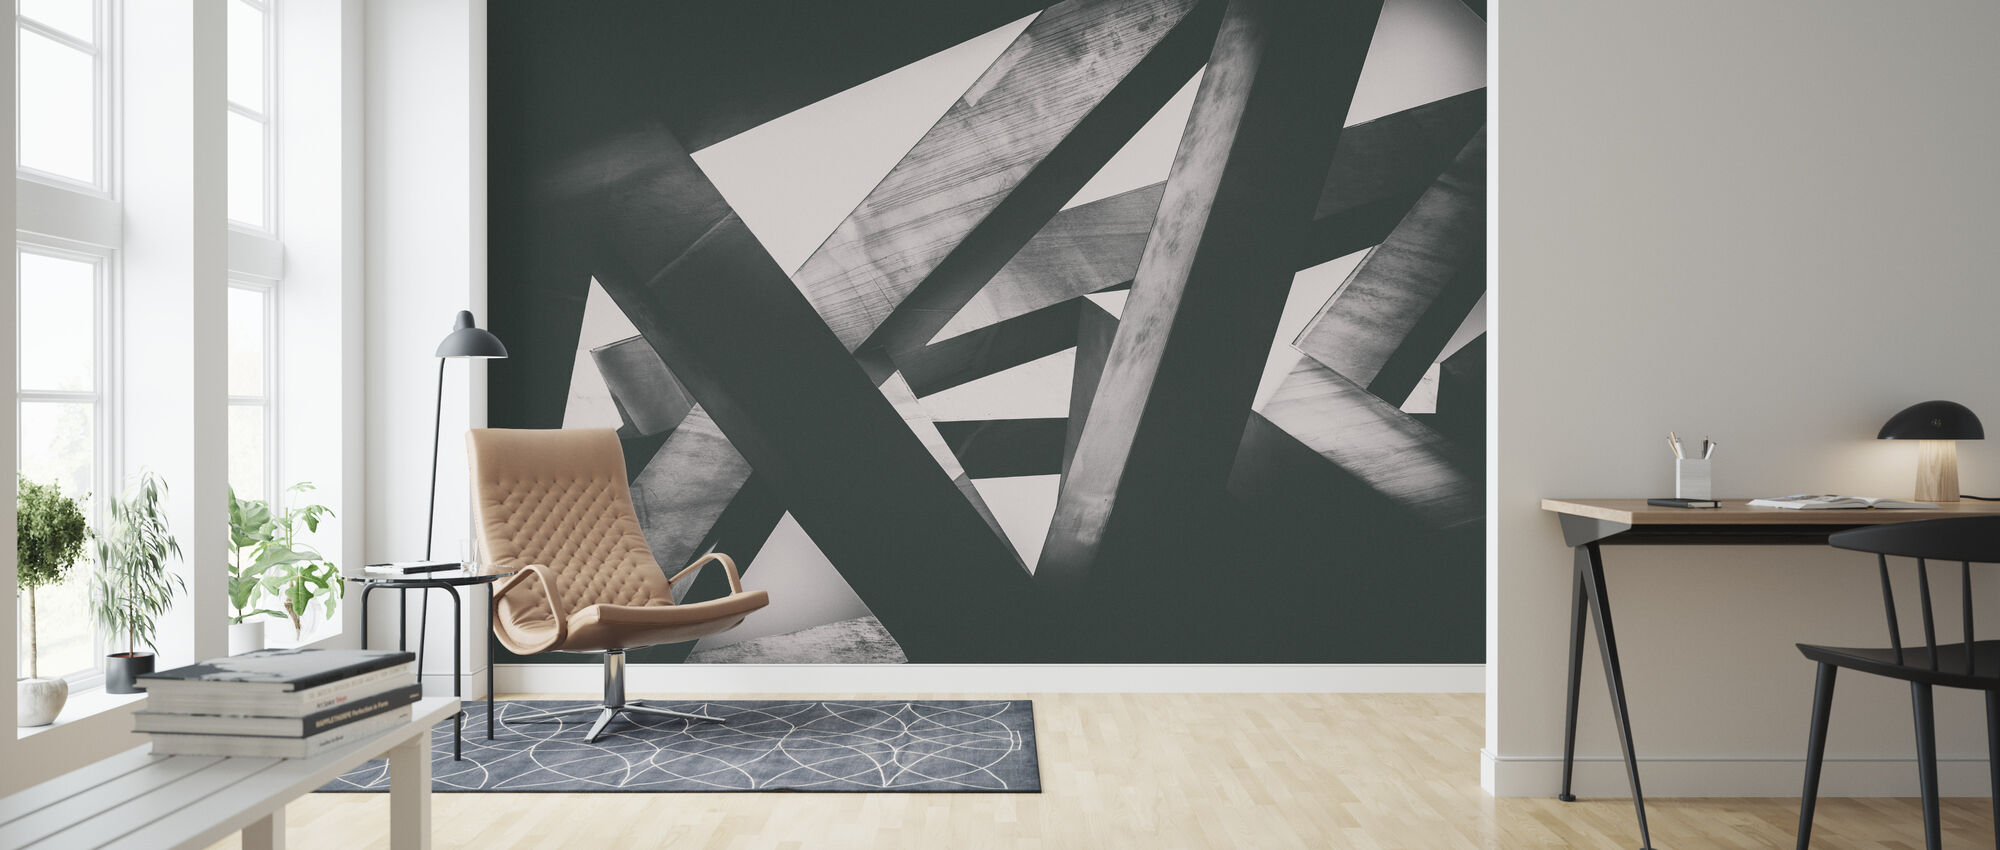 Concrete Pillars - Wallpaper - Living Room